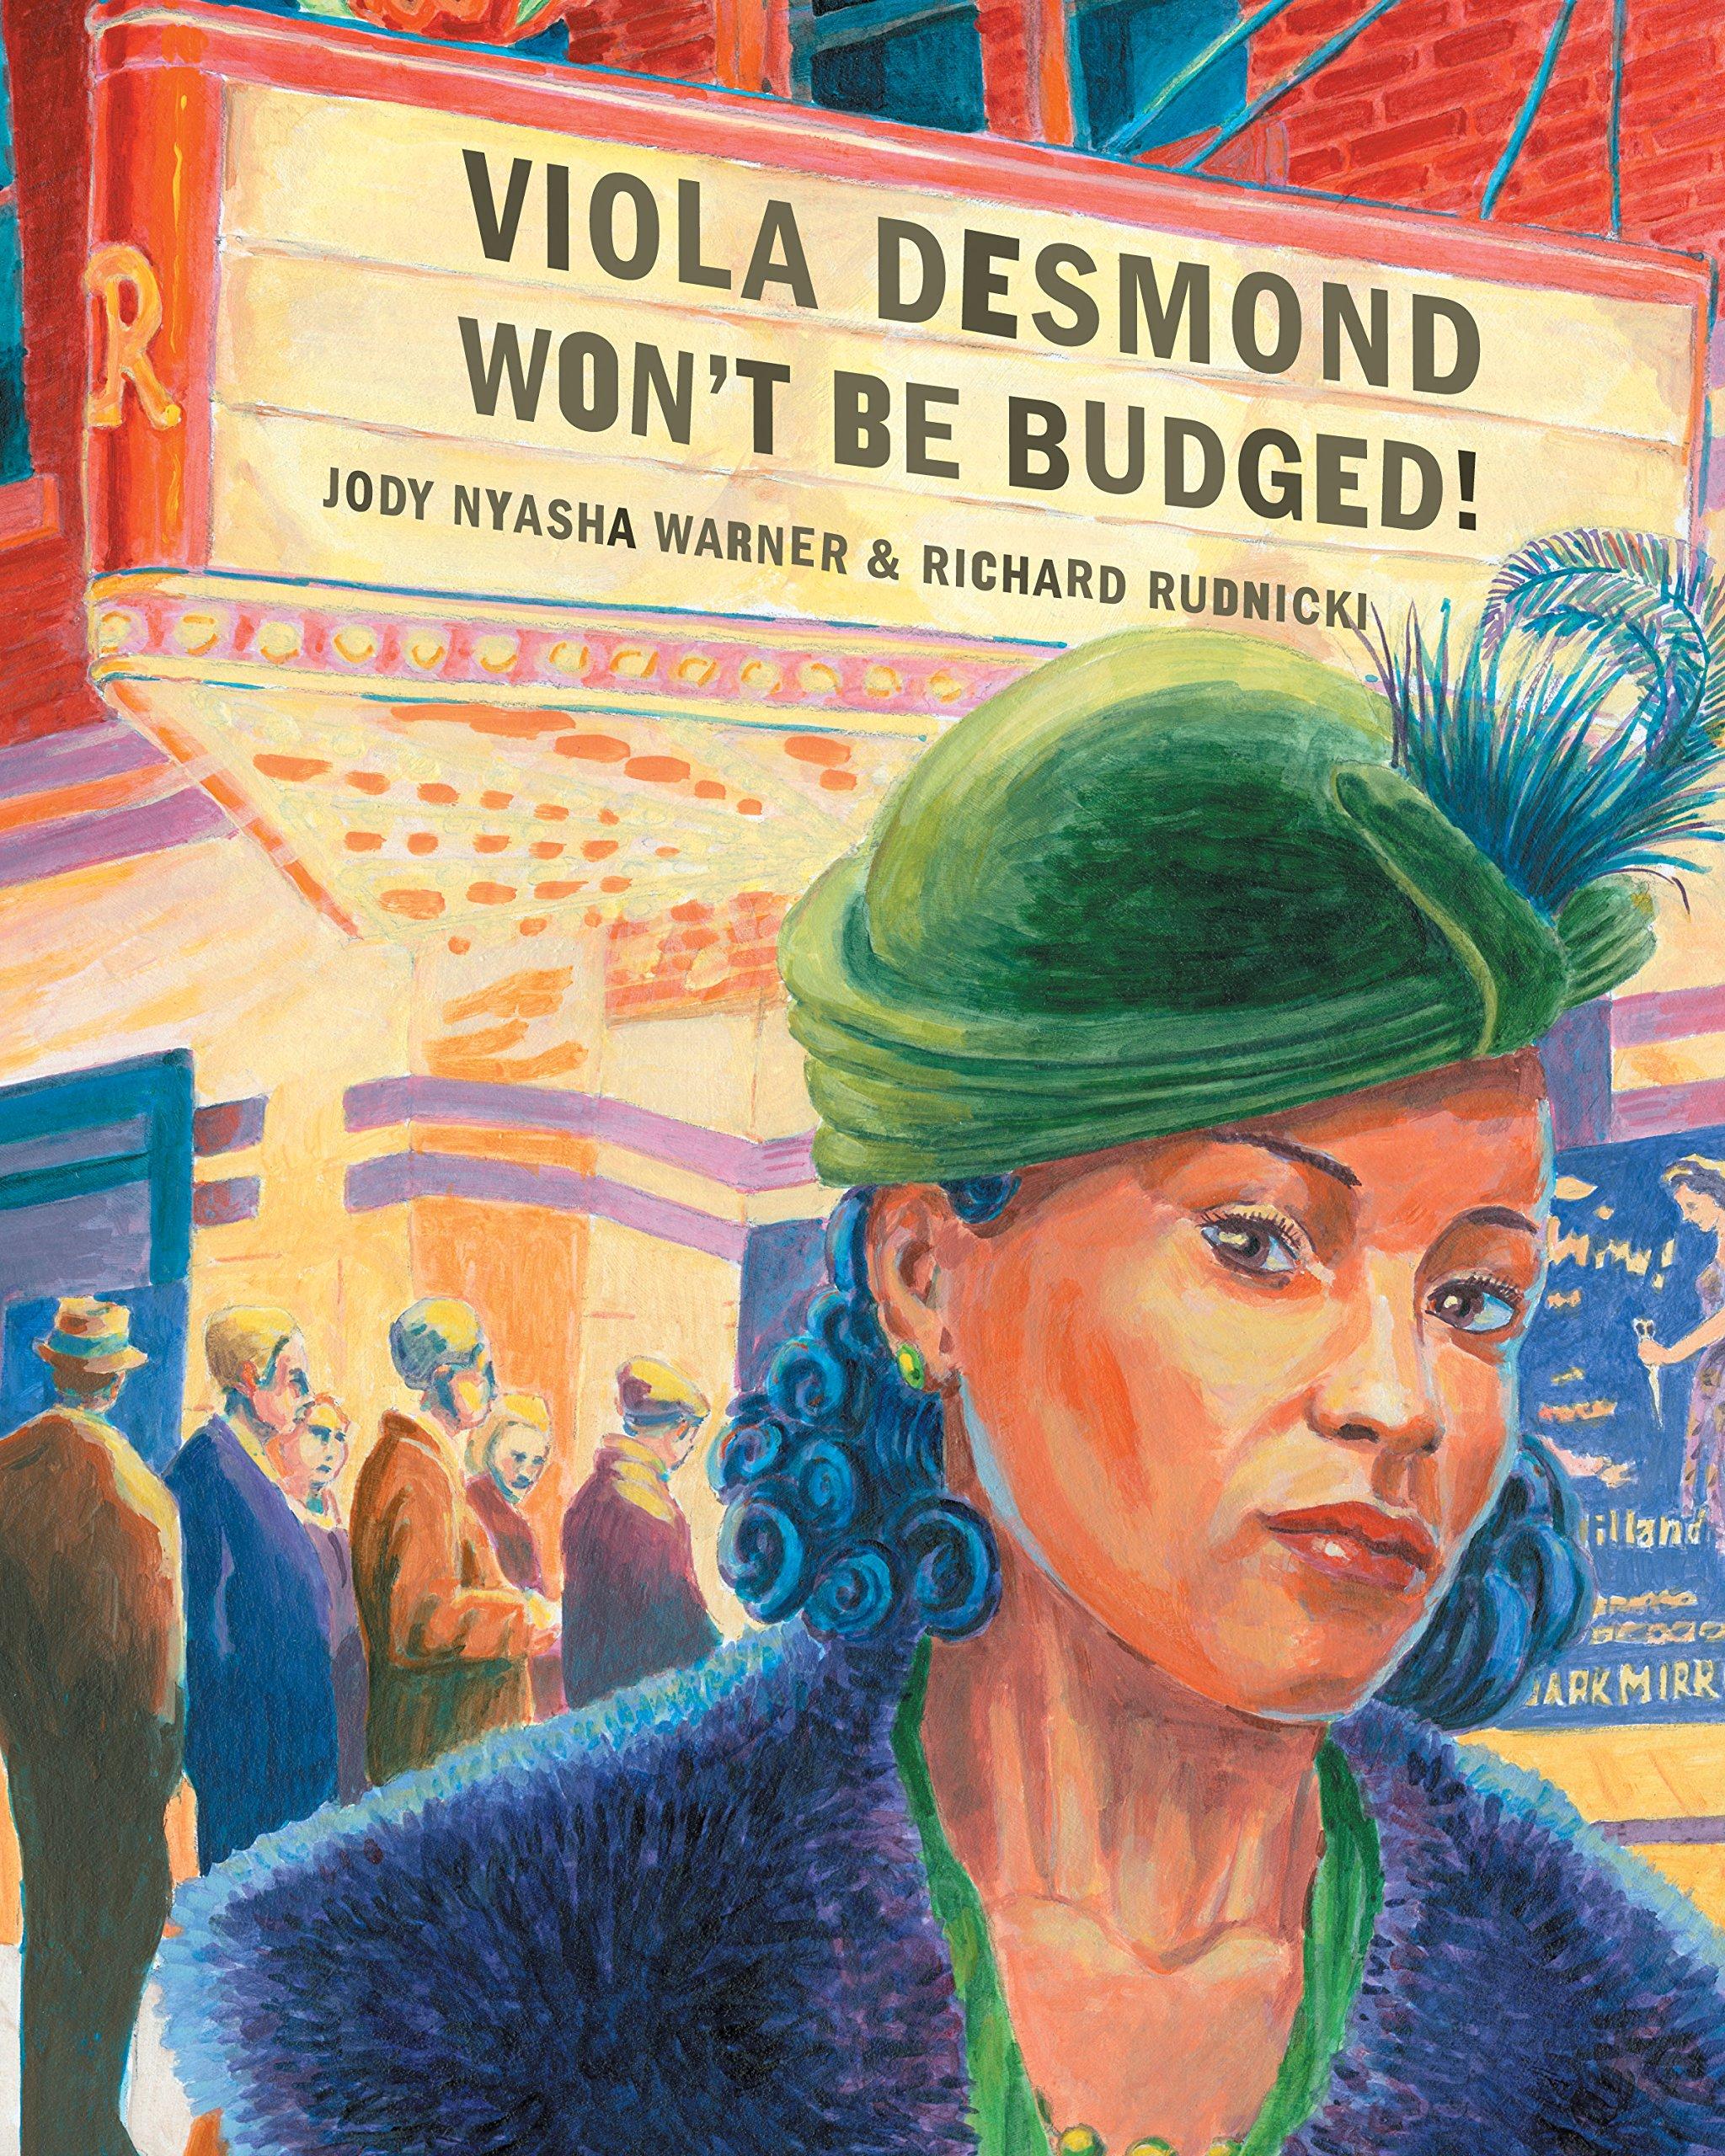 Viola desmond clipart picture Viola Desmond Won\'t Be Budged: Jody Nyasha Warner, Richard ... picture